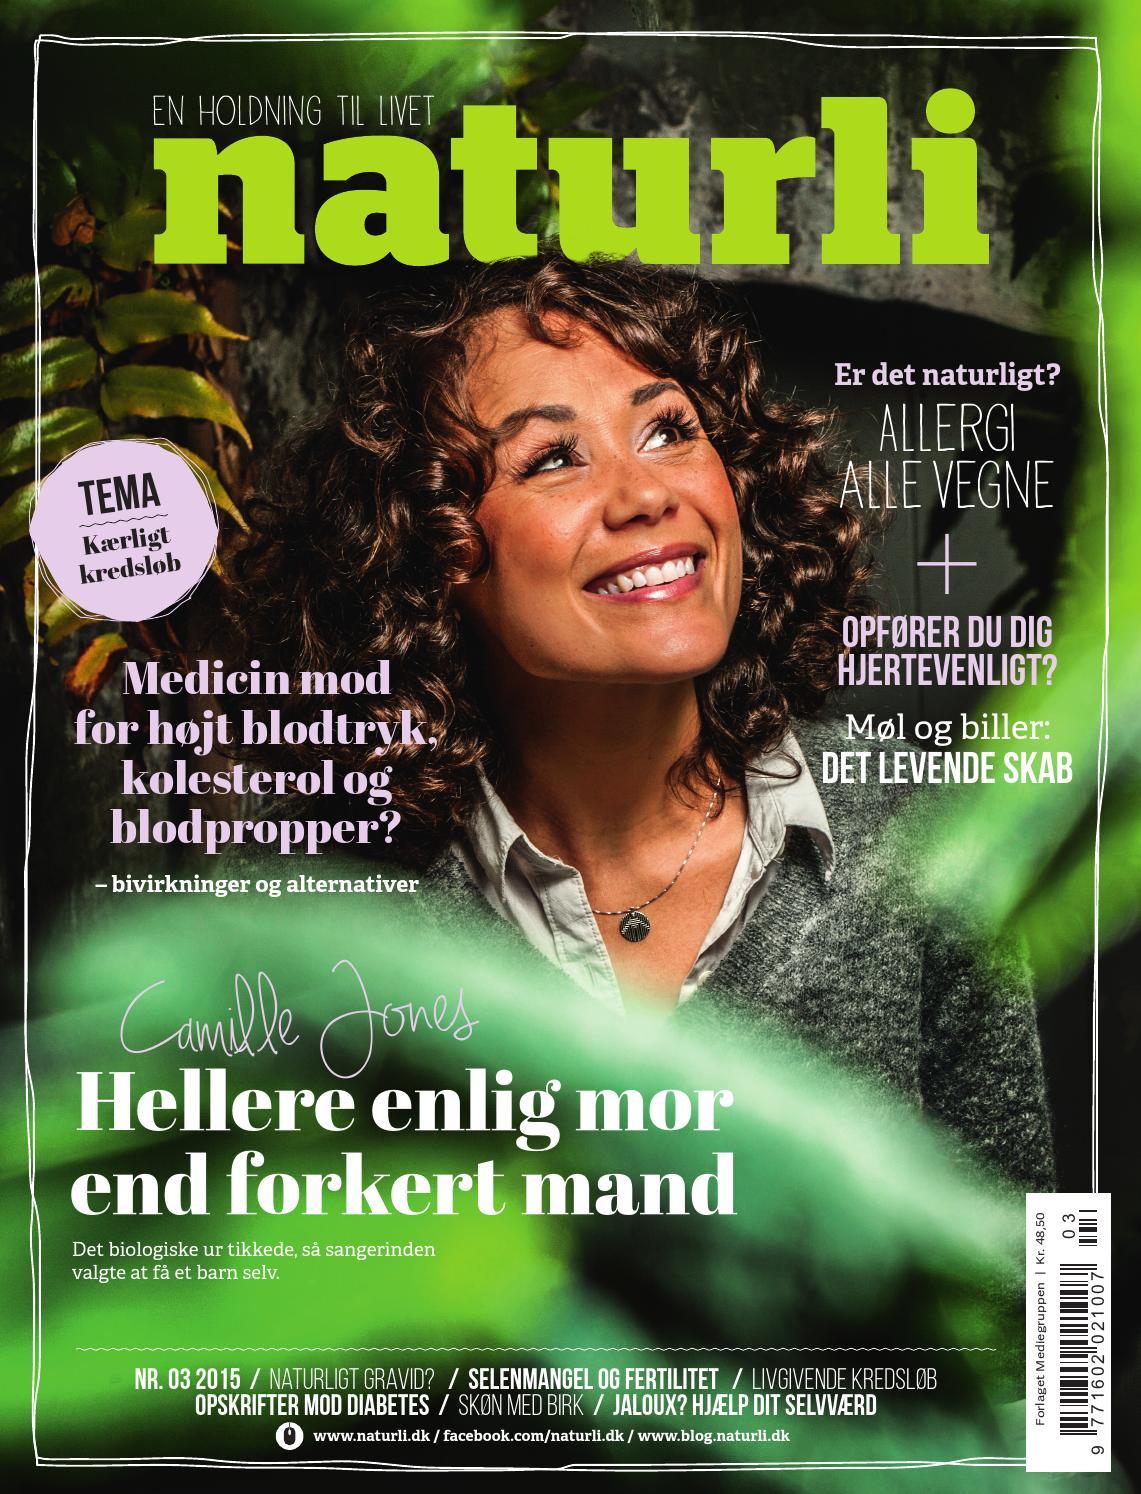 Naturli 01, 2016 by Mediegruppen as - issuu